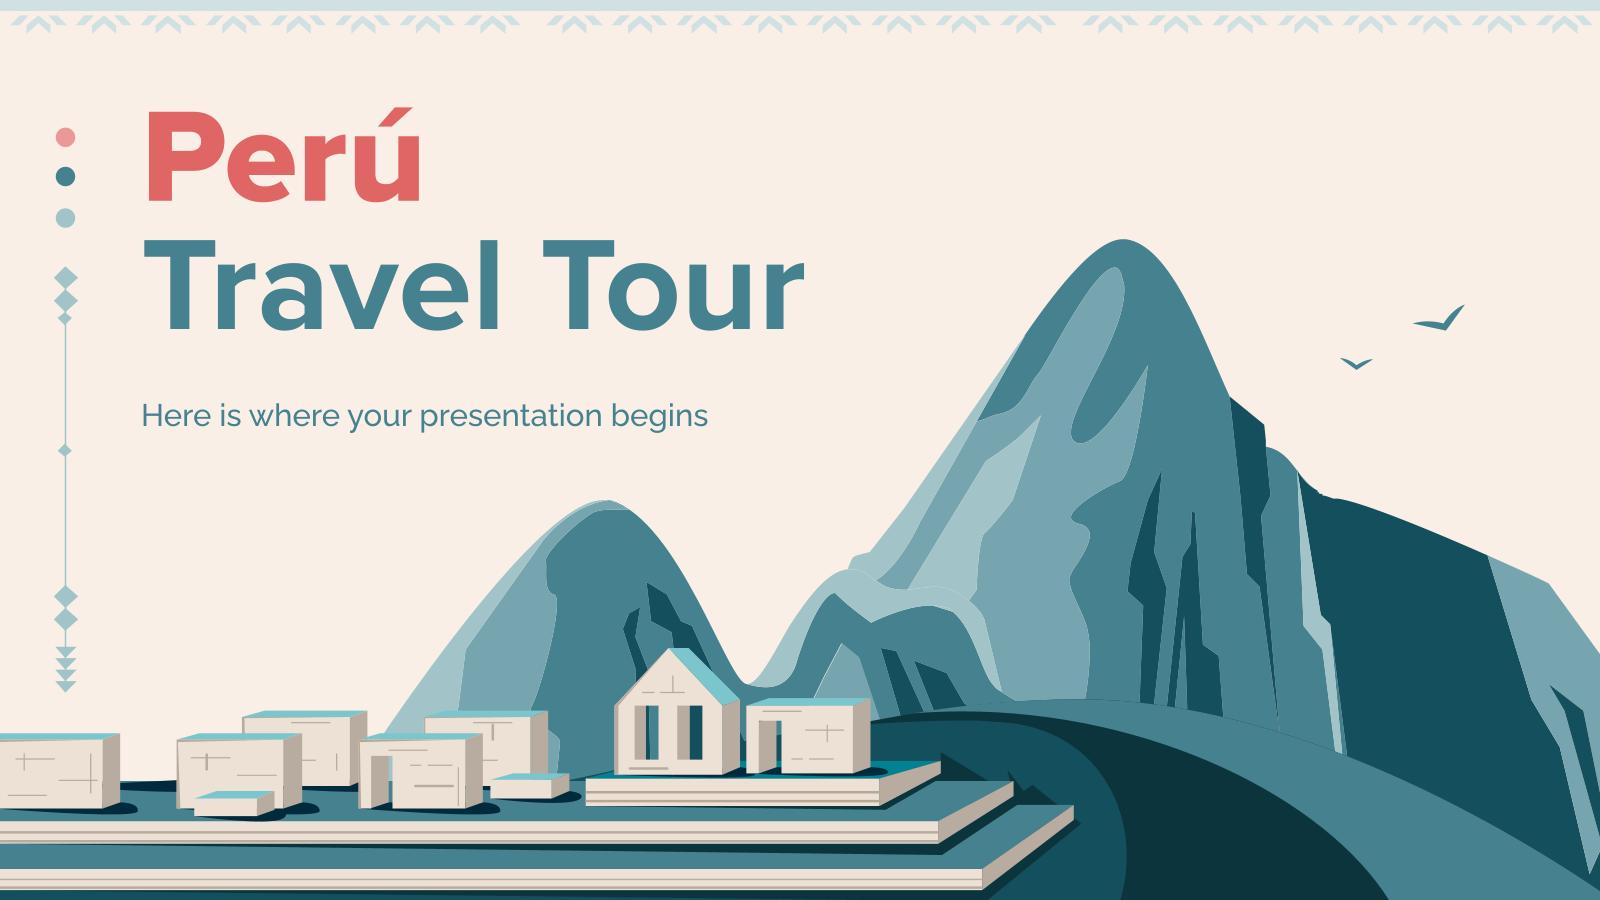 Peru Travel Tour presentation template